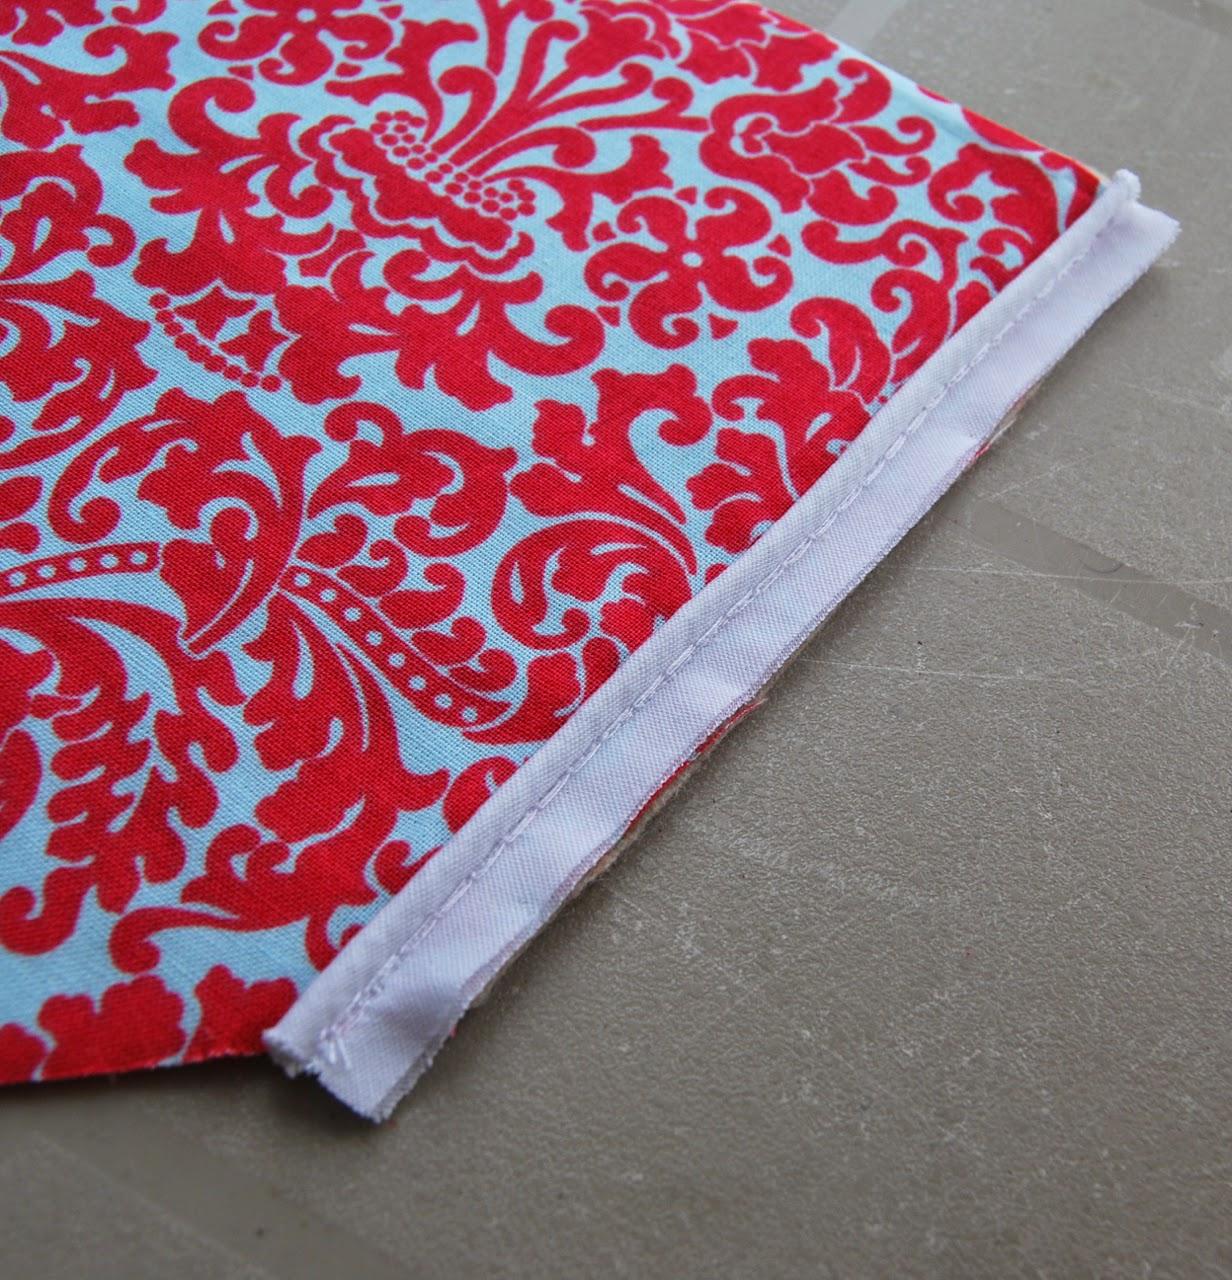 piping sewn on